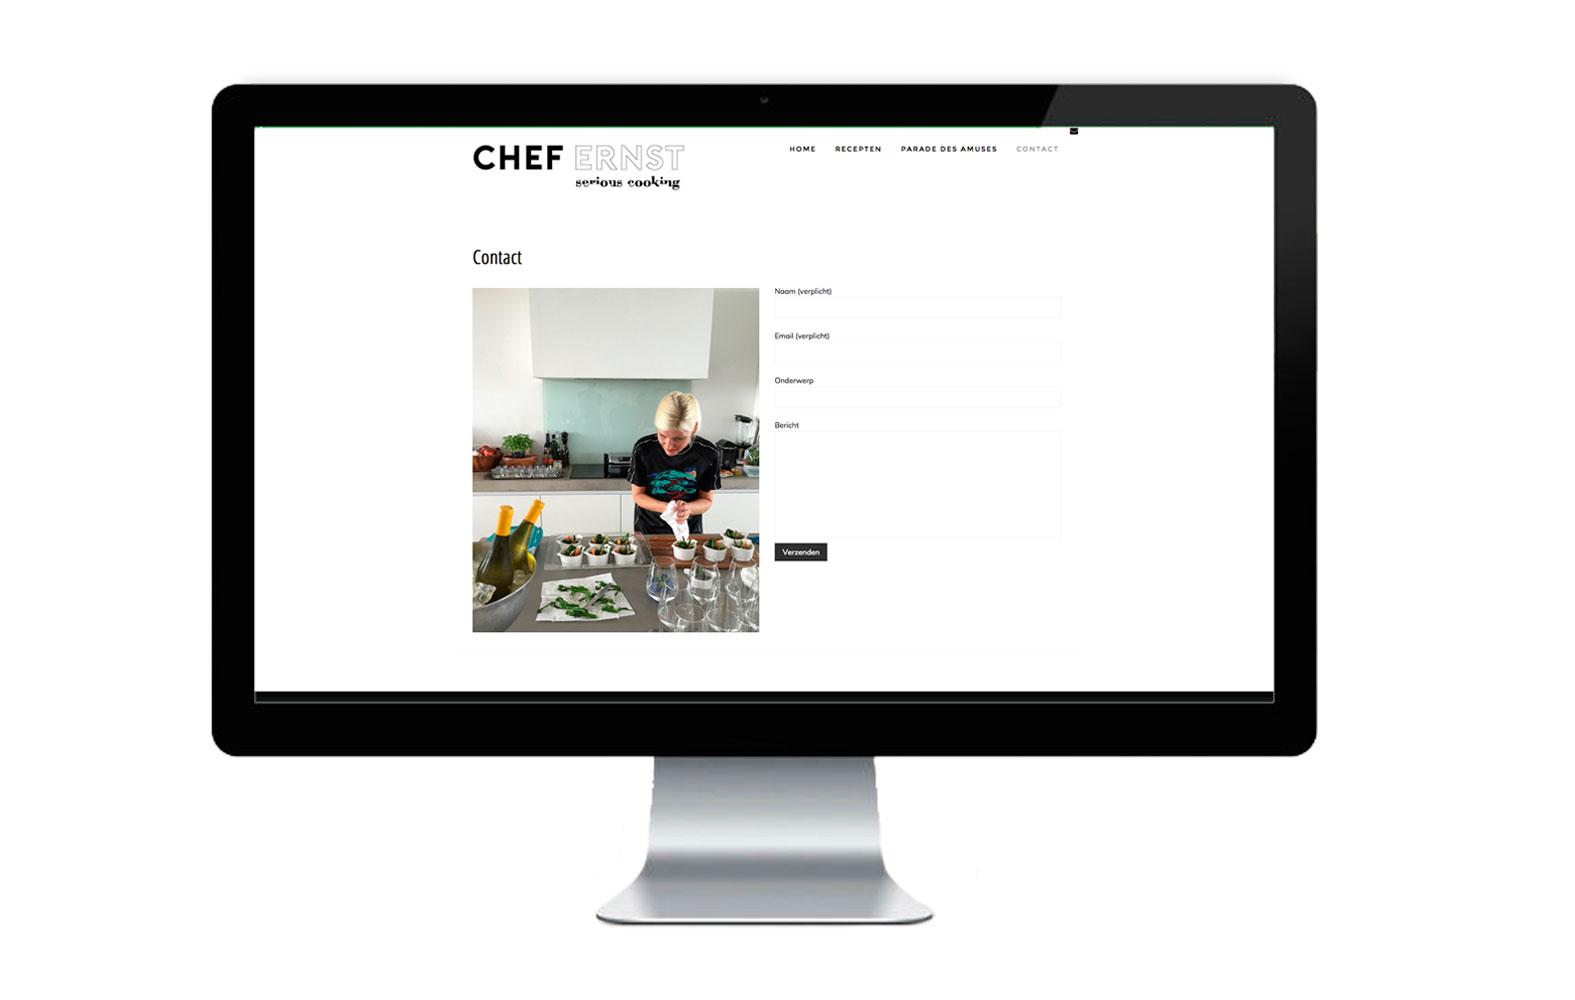 Chef-Ernst-serious-cooking-website-contact-Studio-Ernst